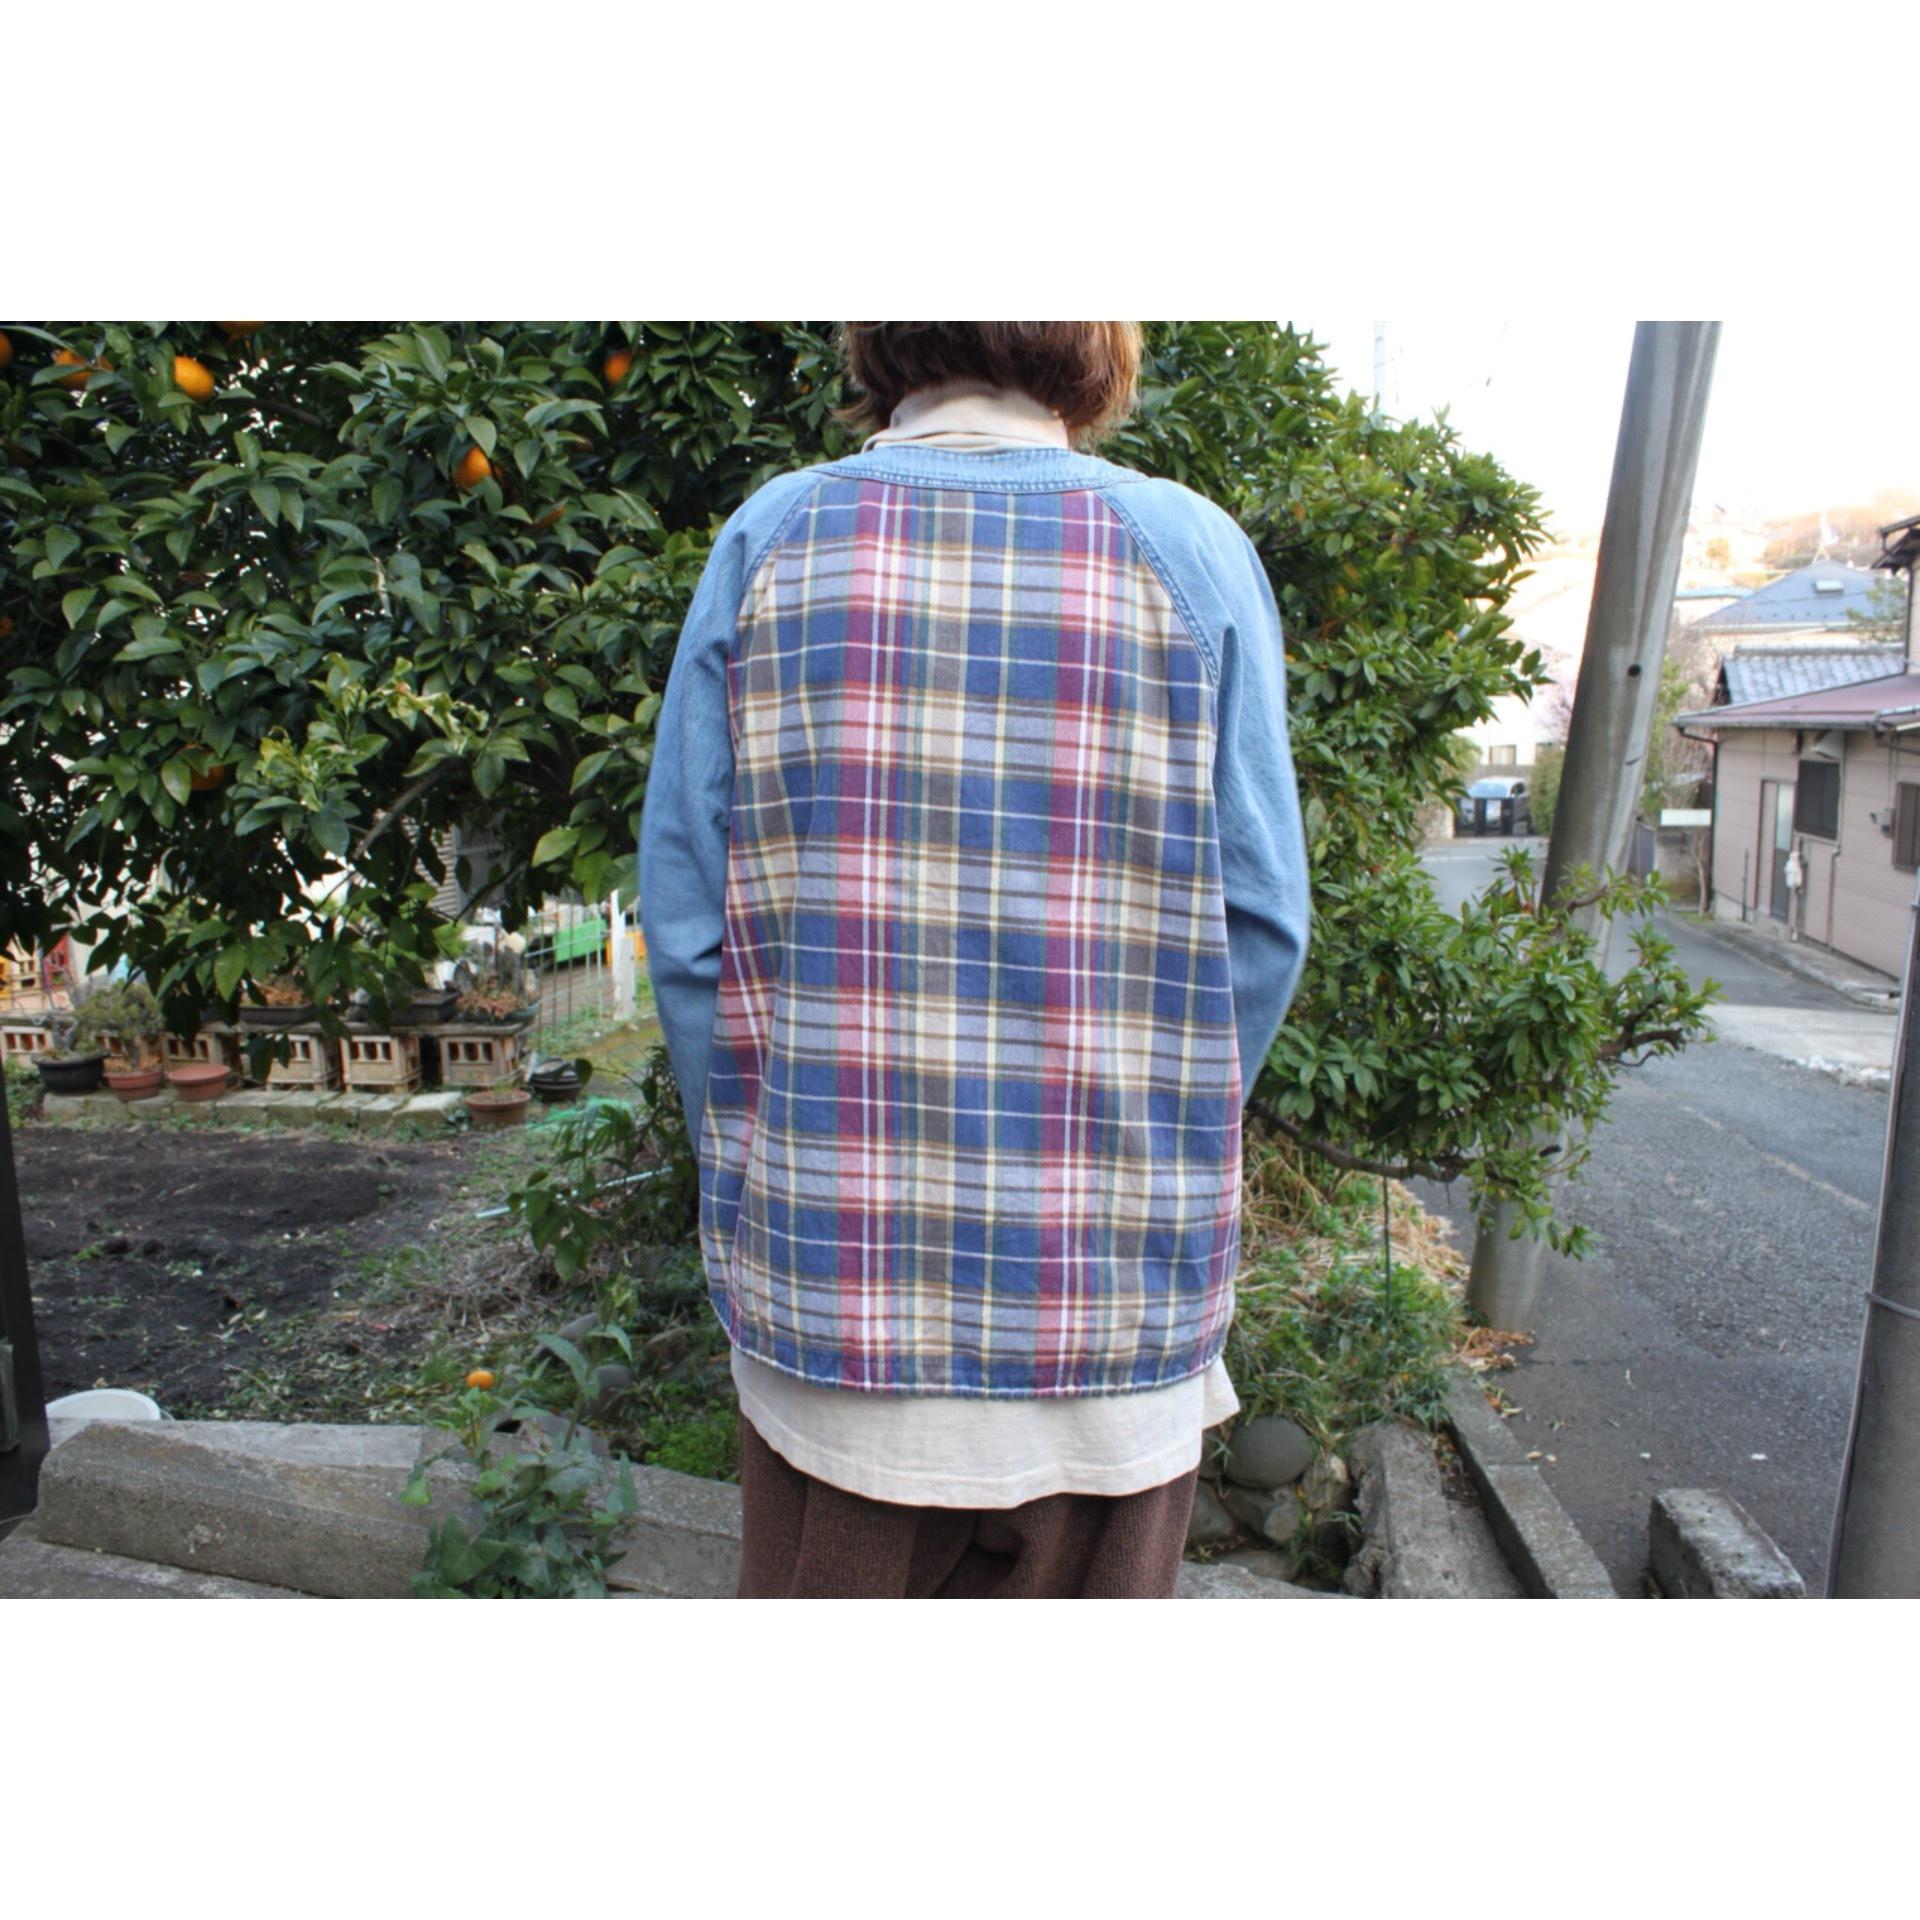 Vintage denim × cotton check pullover jacket